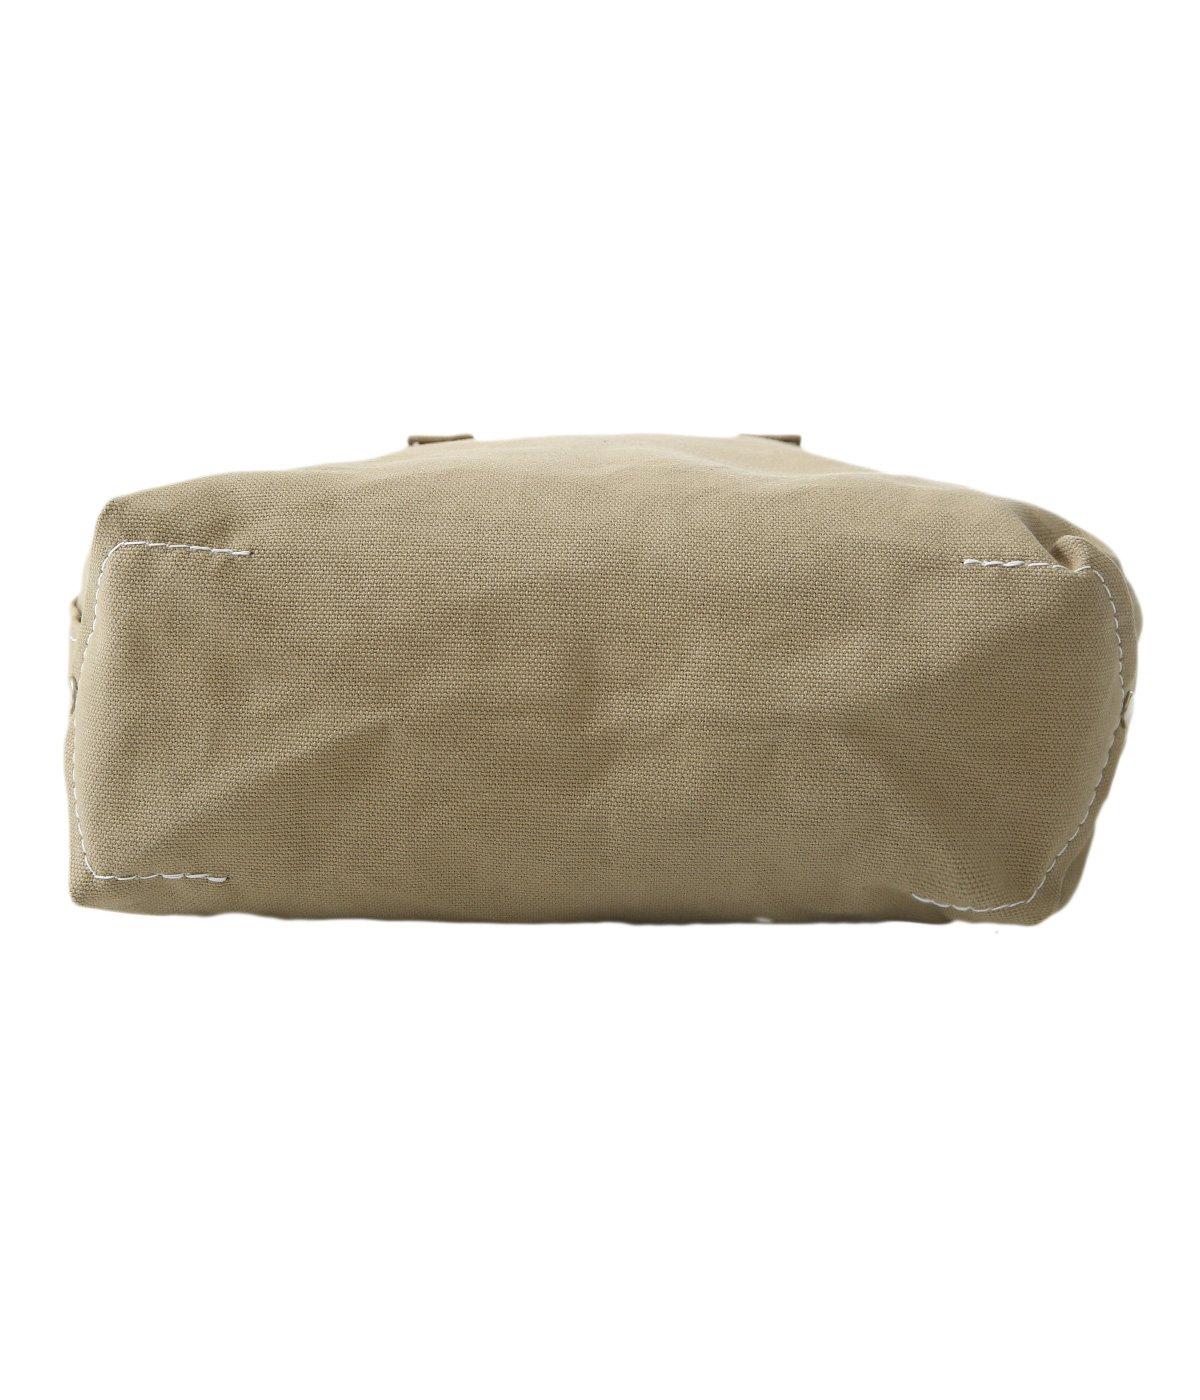 TOTE BAG SMALL